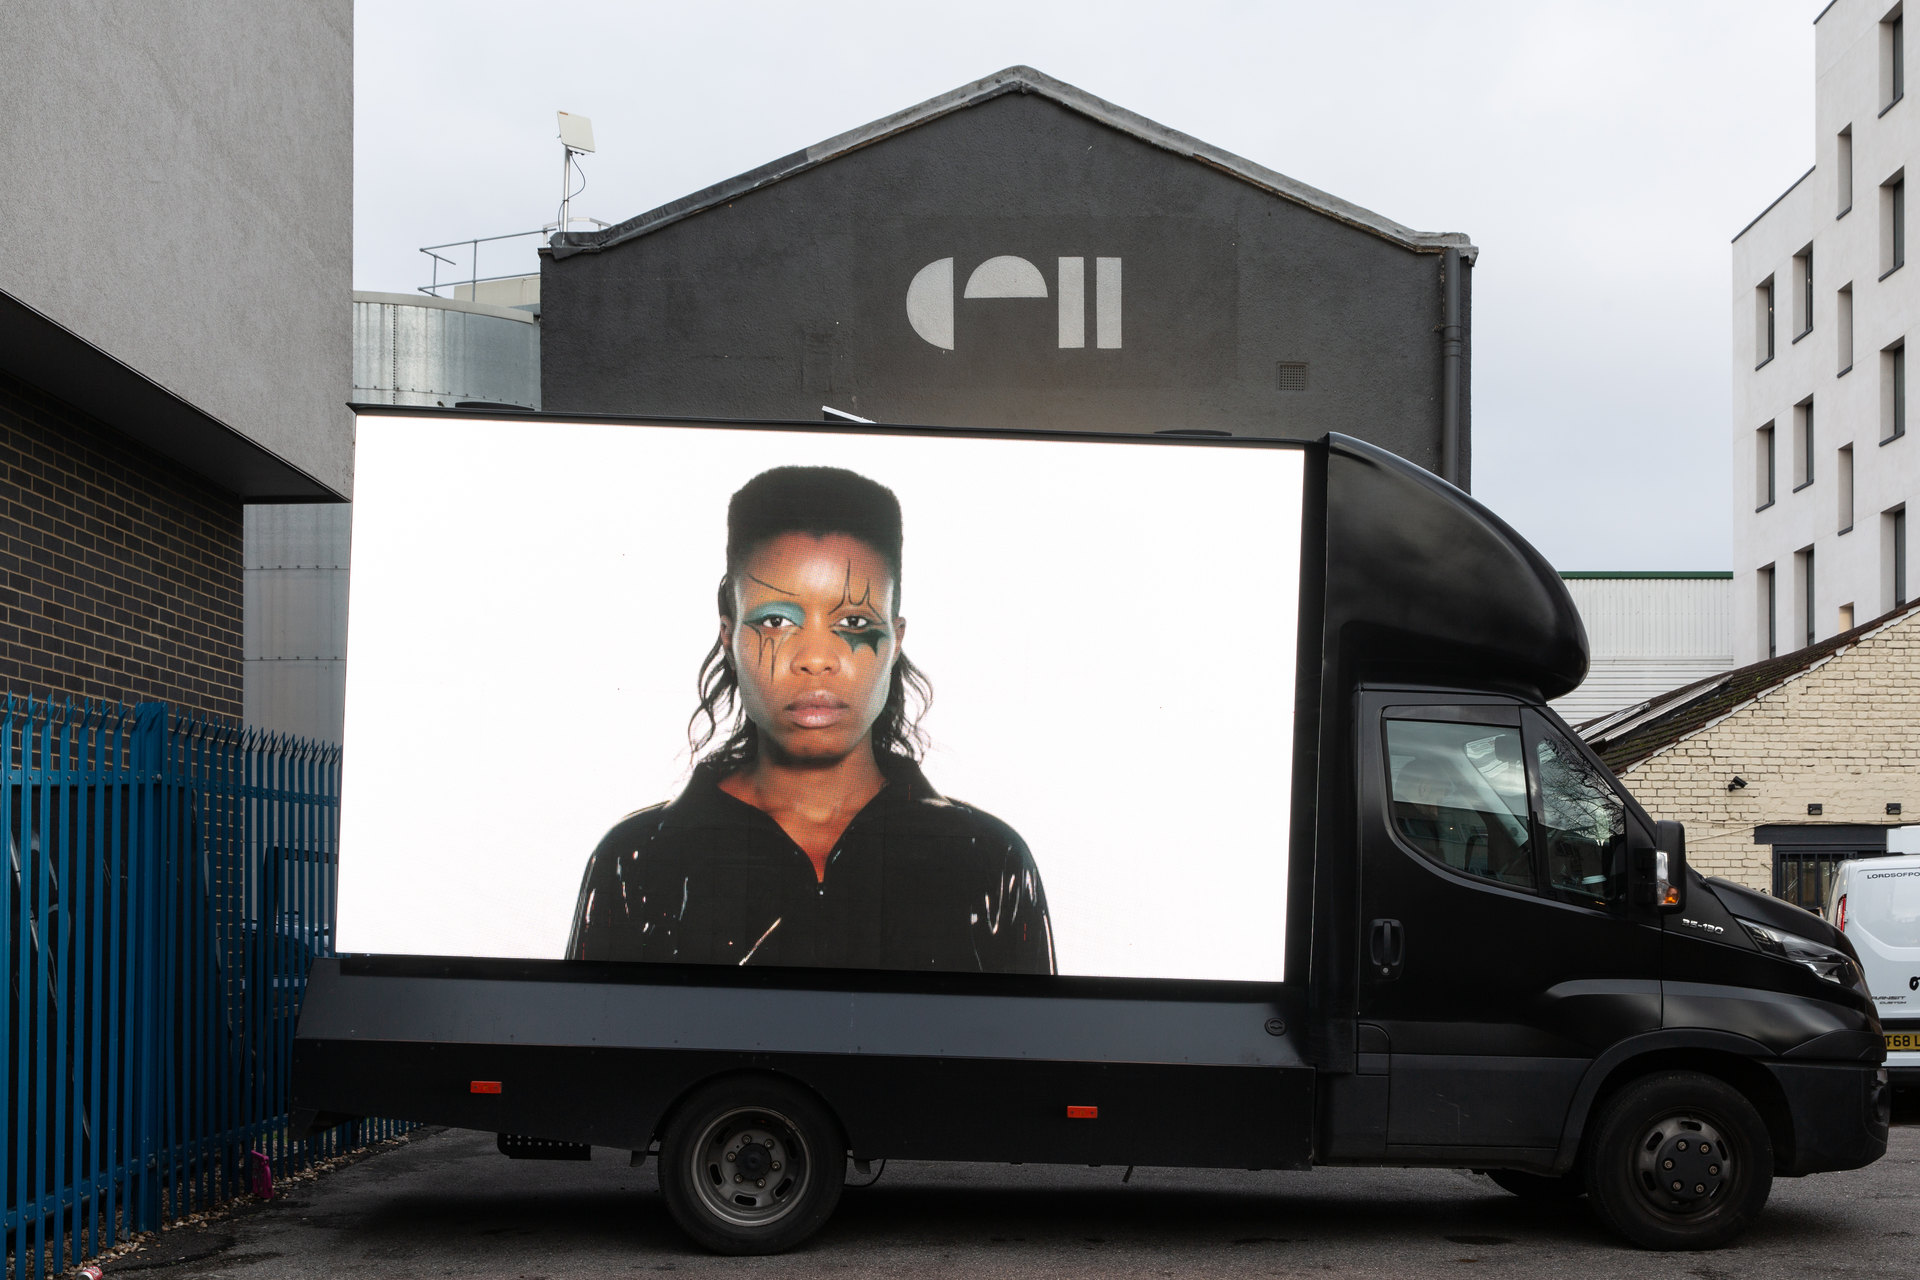 Nevermind (Screen Test 1), 2020, Cell Project Space Carpark, Cambridge Heath Road, London, E2 9DA